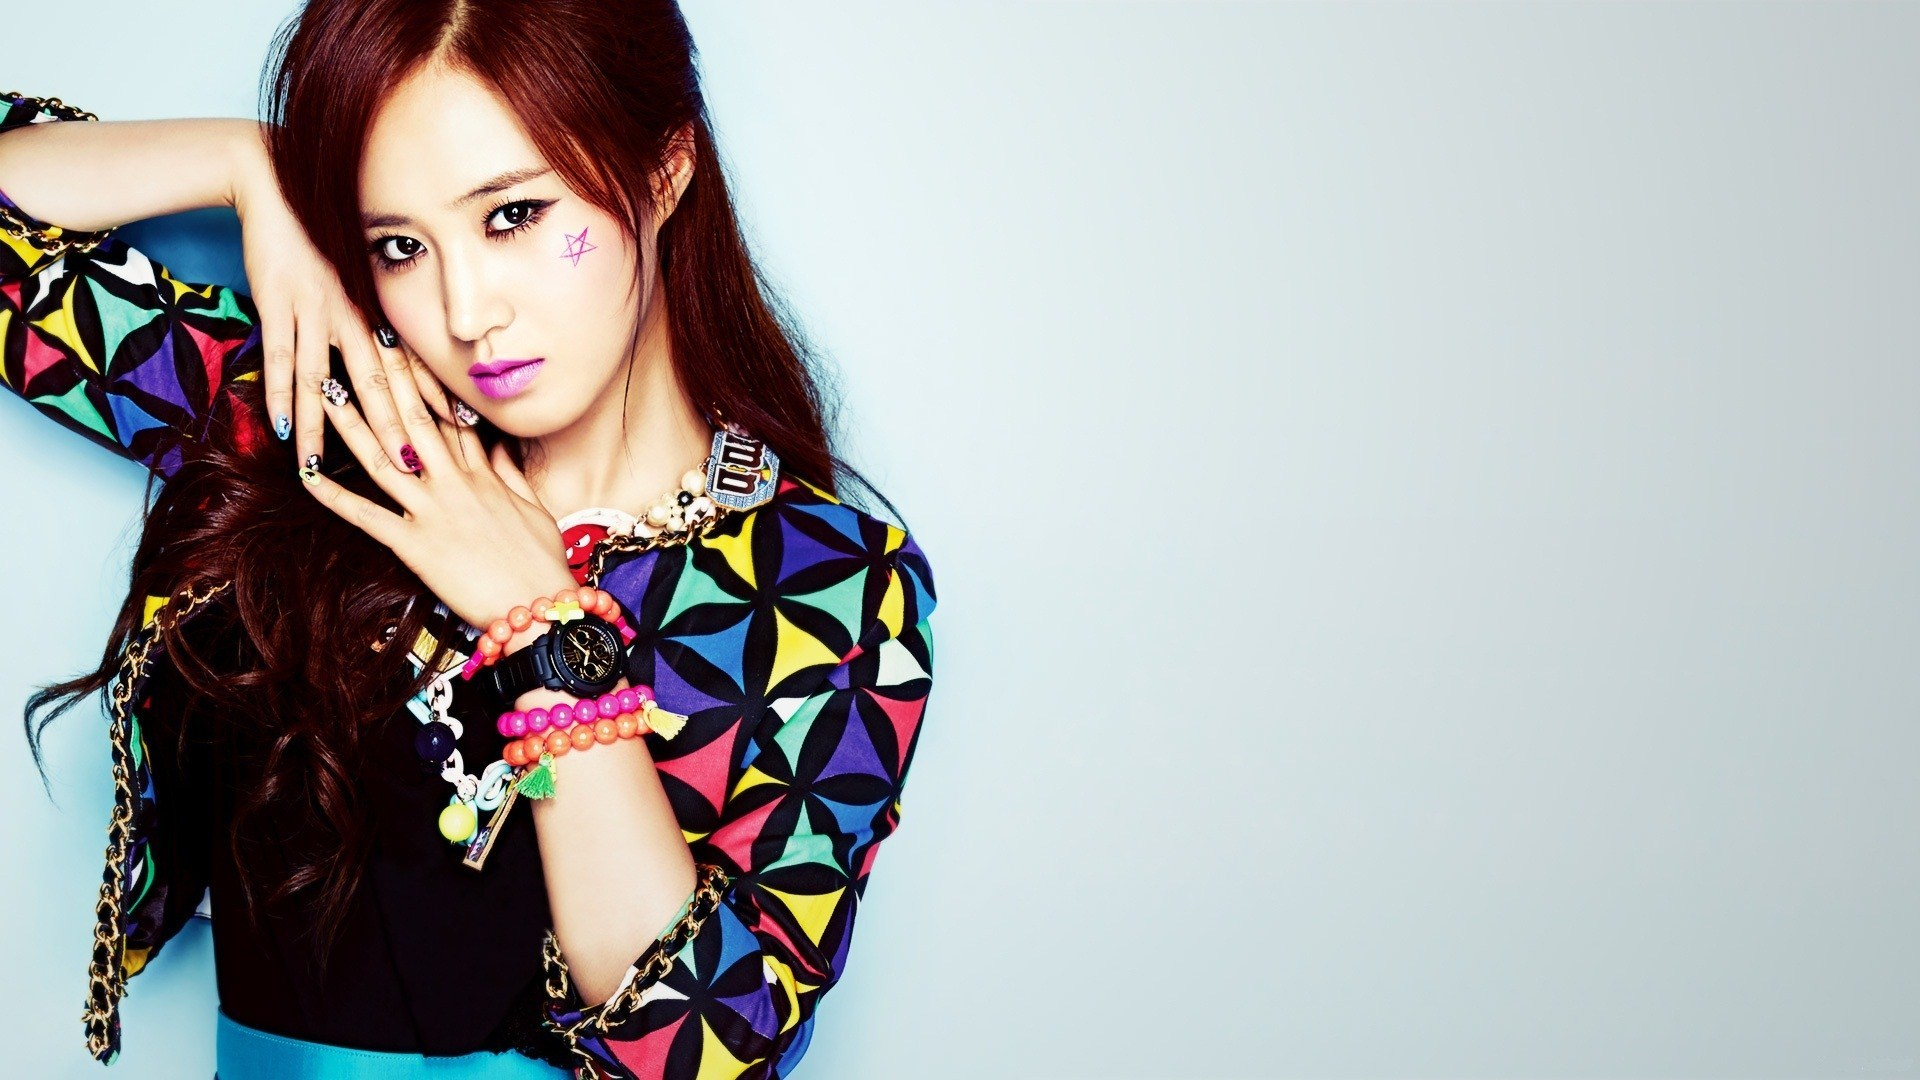 Singer Beauty Korean Girl HD HD Wallpaper